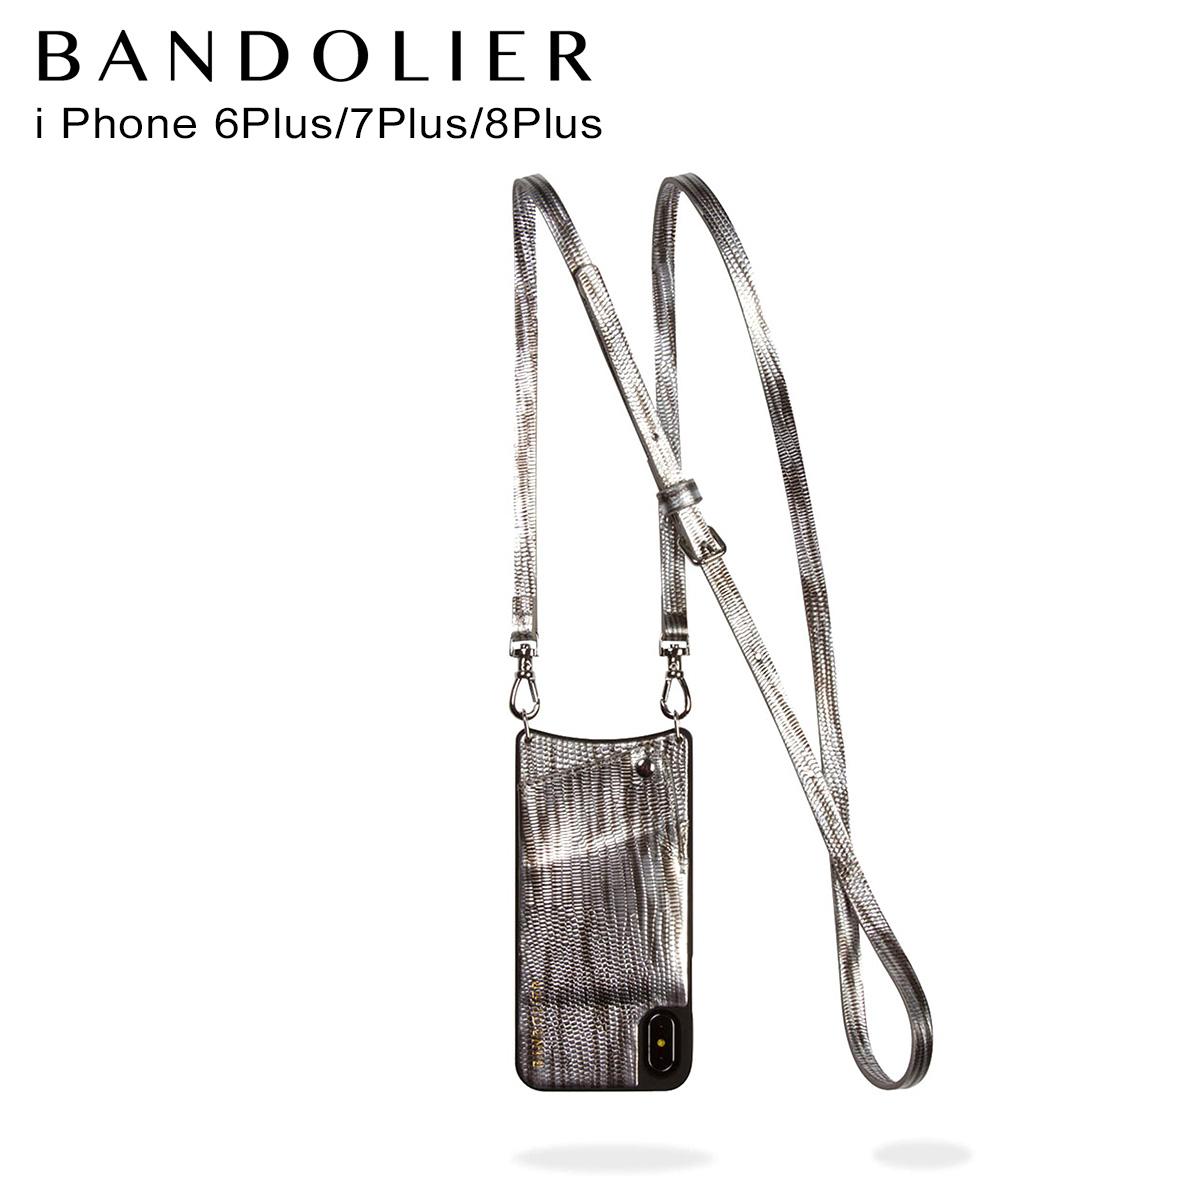 BANDOLIER バンドリヤー iPhone8 iPhone7 7Plus 6s ケース スマホ アイフォン レザー SILVER WAVEA メンズ レディース シルバー 10EMM